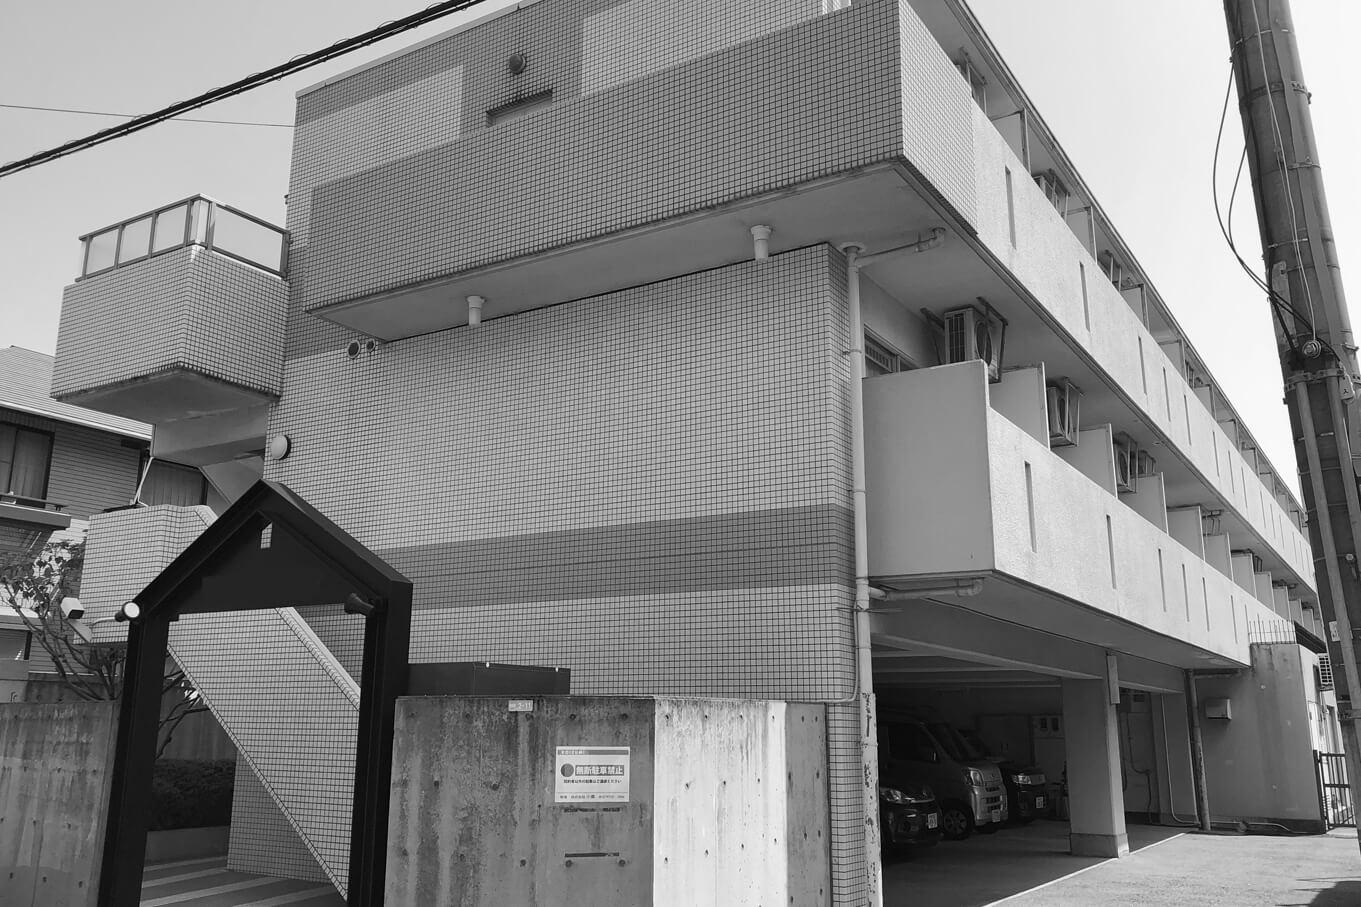 Sマンション大規模改修(計画中) -2